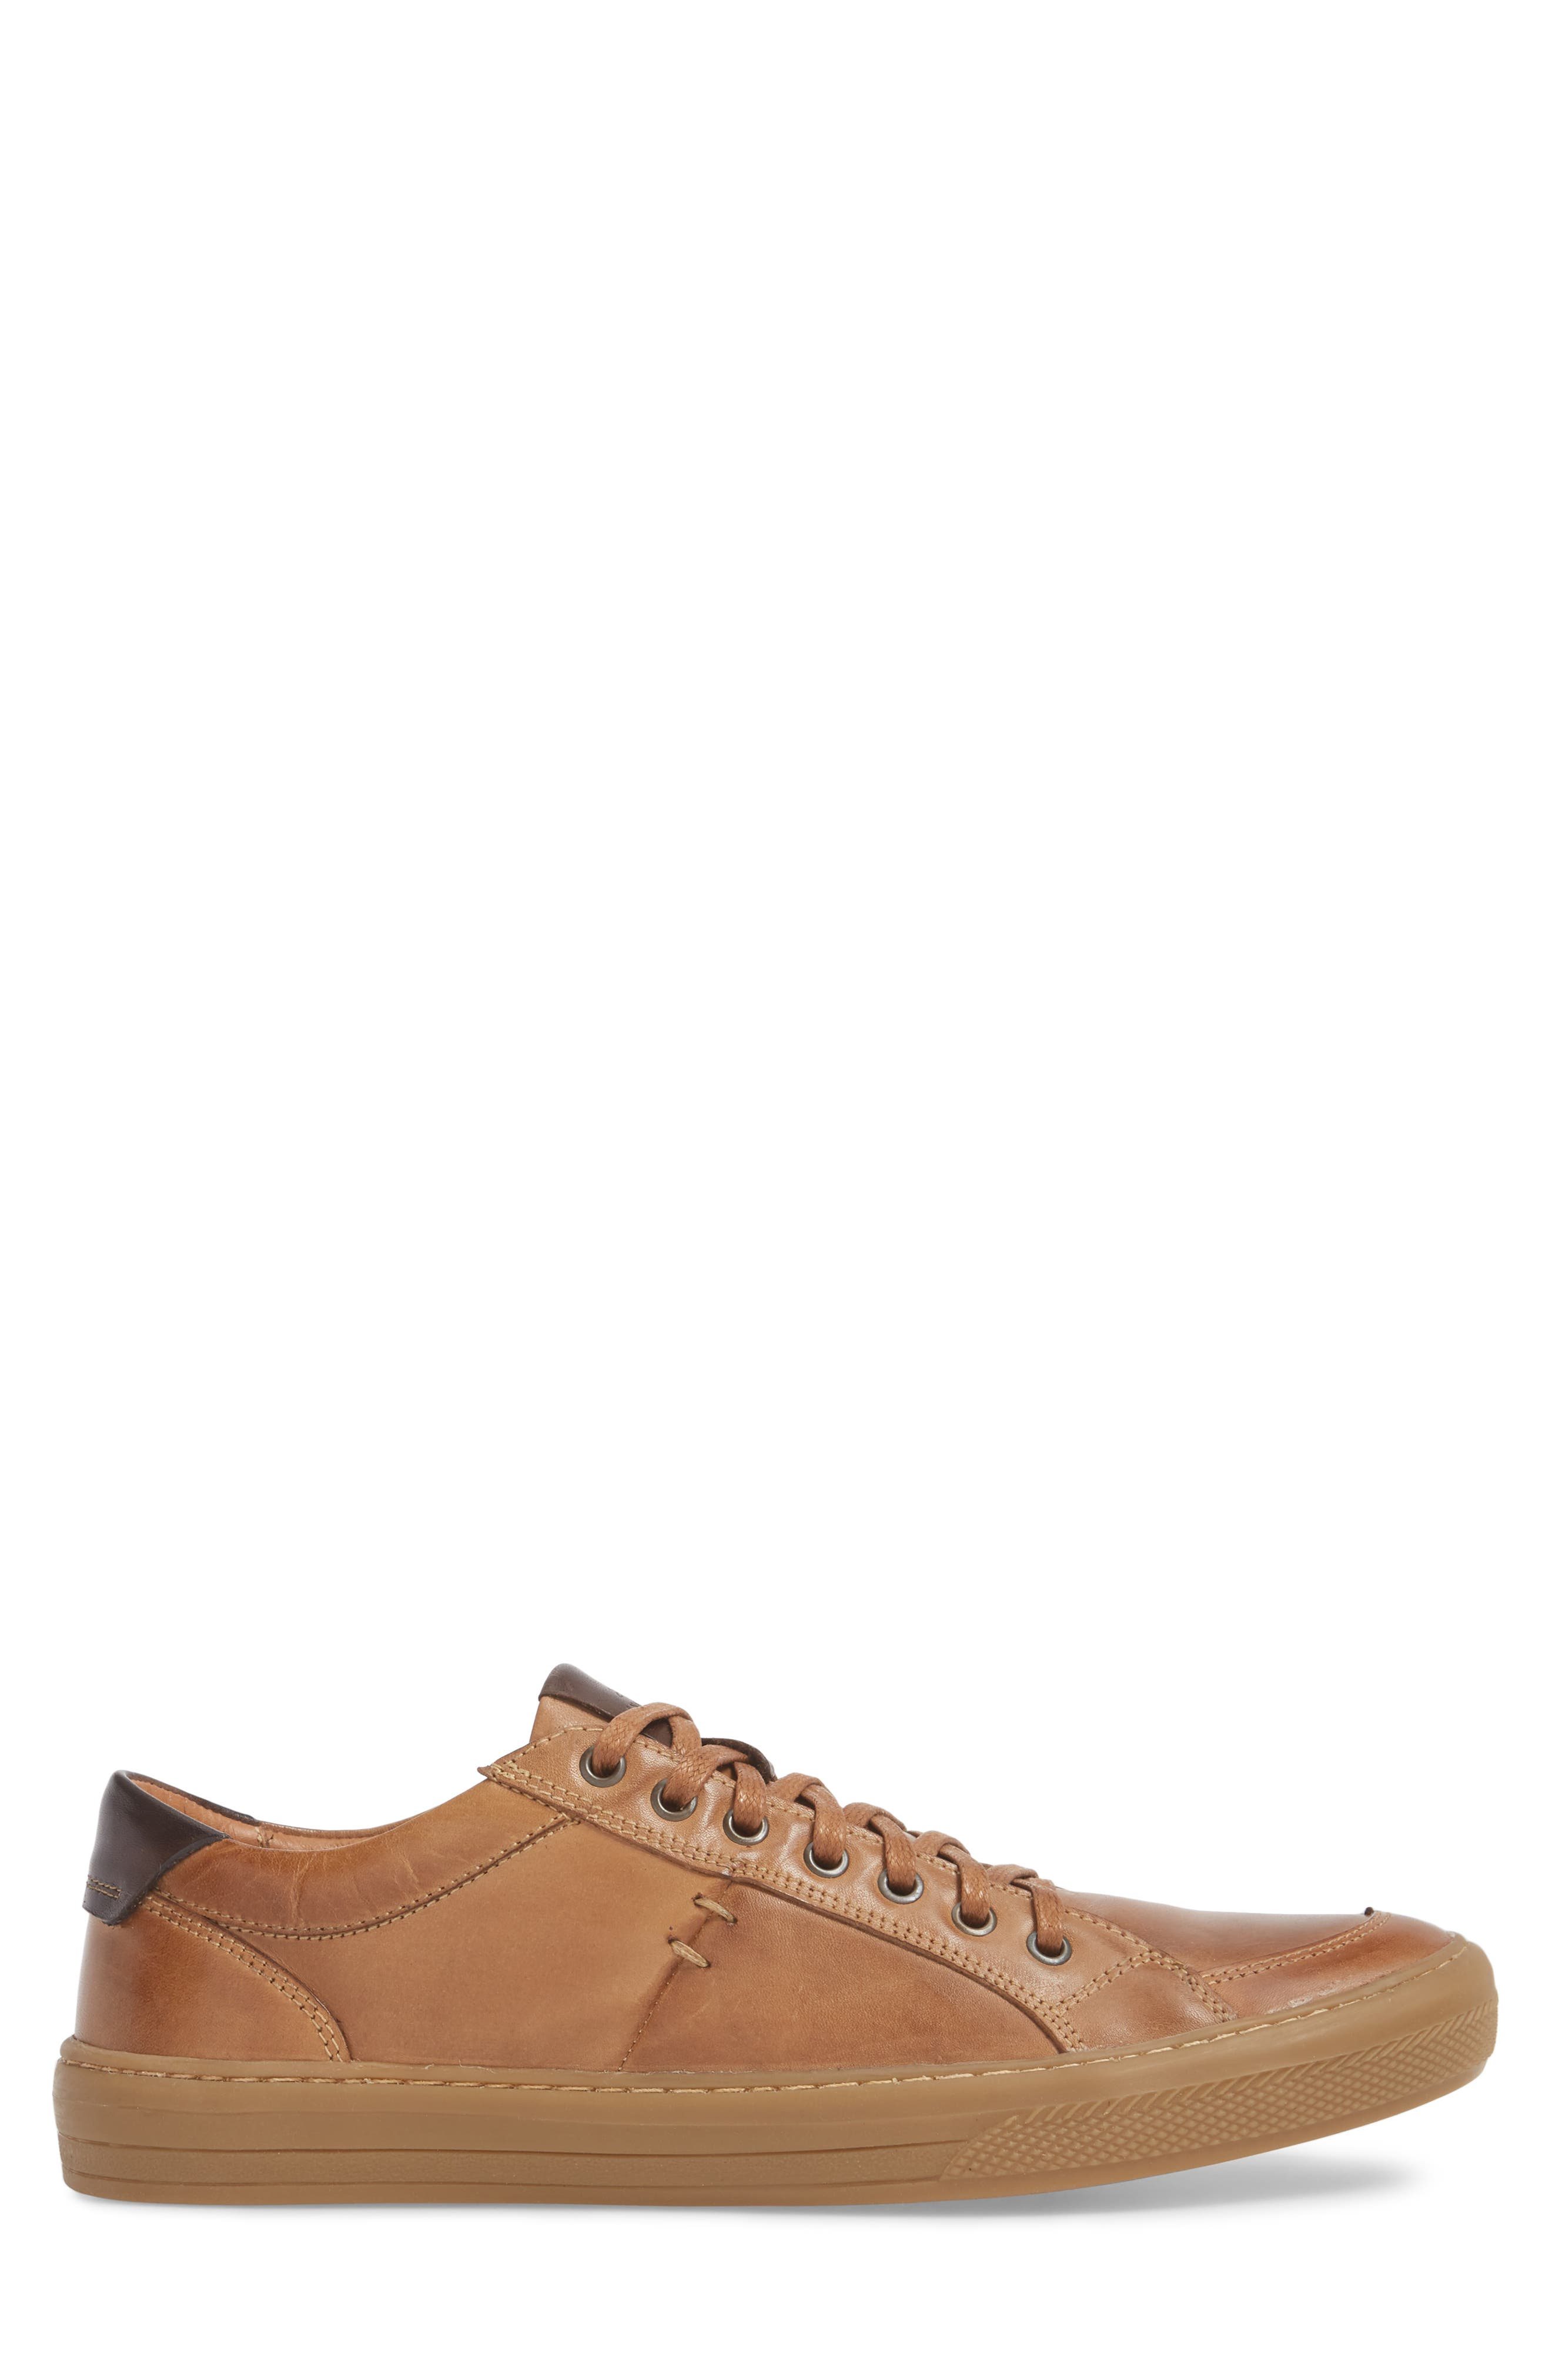 Bilac Low Top Sneaker,                             Alternate thumbnail 3, color,                             Touch Bronze/ Castanho Leather